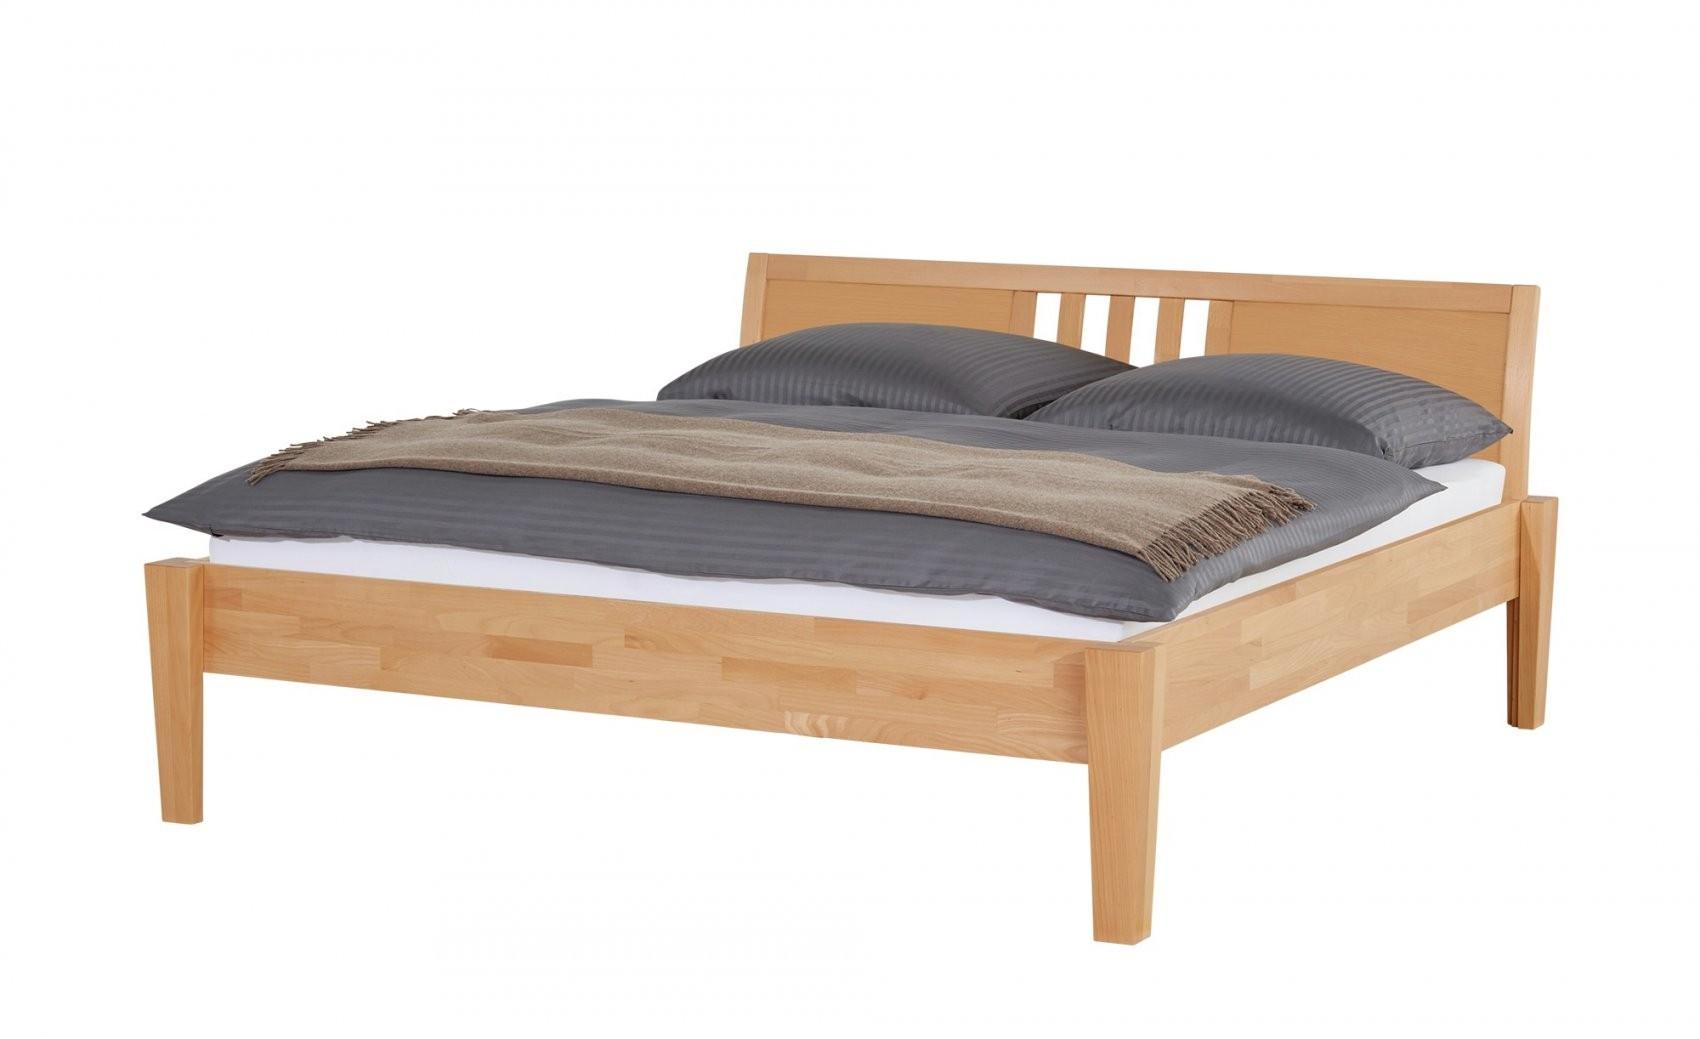 Massivholzbettgestell 140X200  Buche Timber  140 Cm Buche von Bettgestell 140X200 Buche Bild